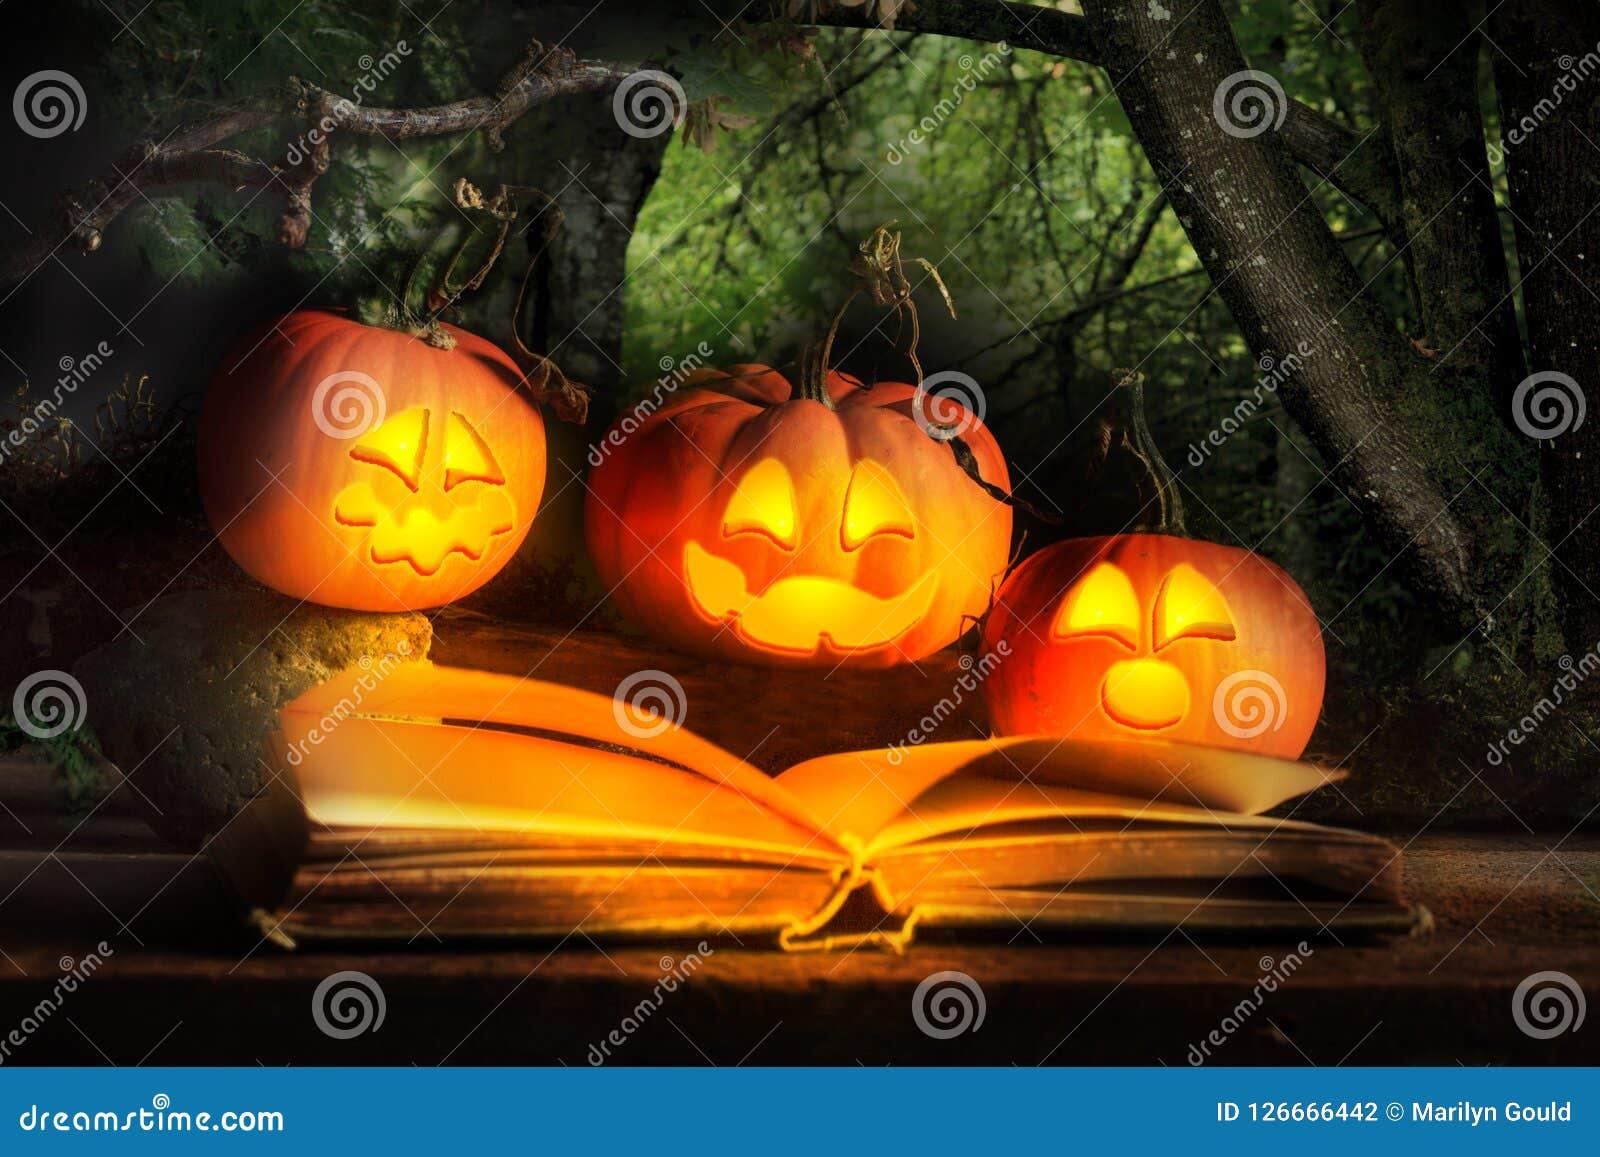 Halloween Jack-O-Lanterns Reading Scary Story Stock Photo